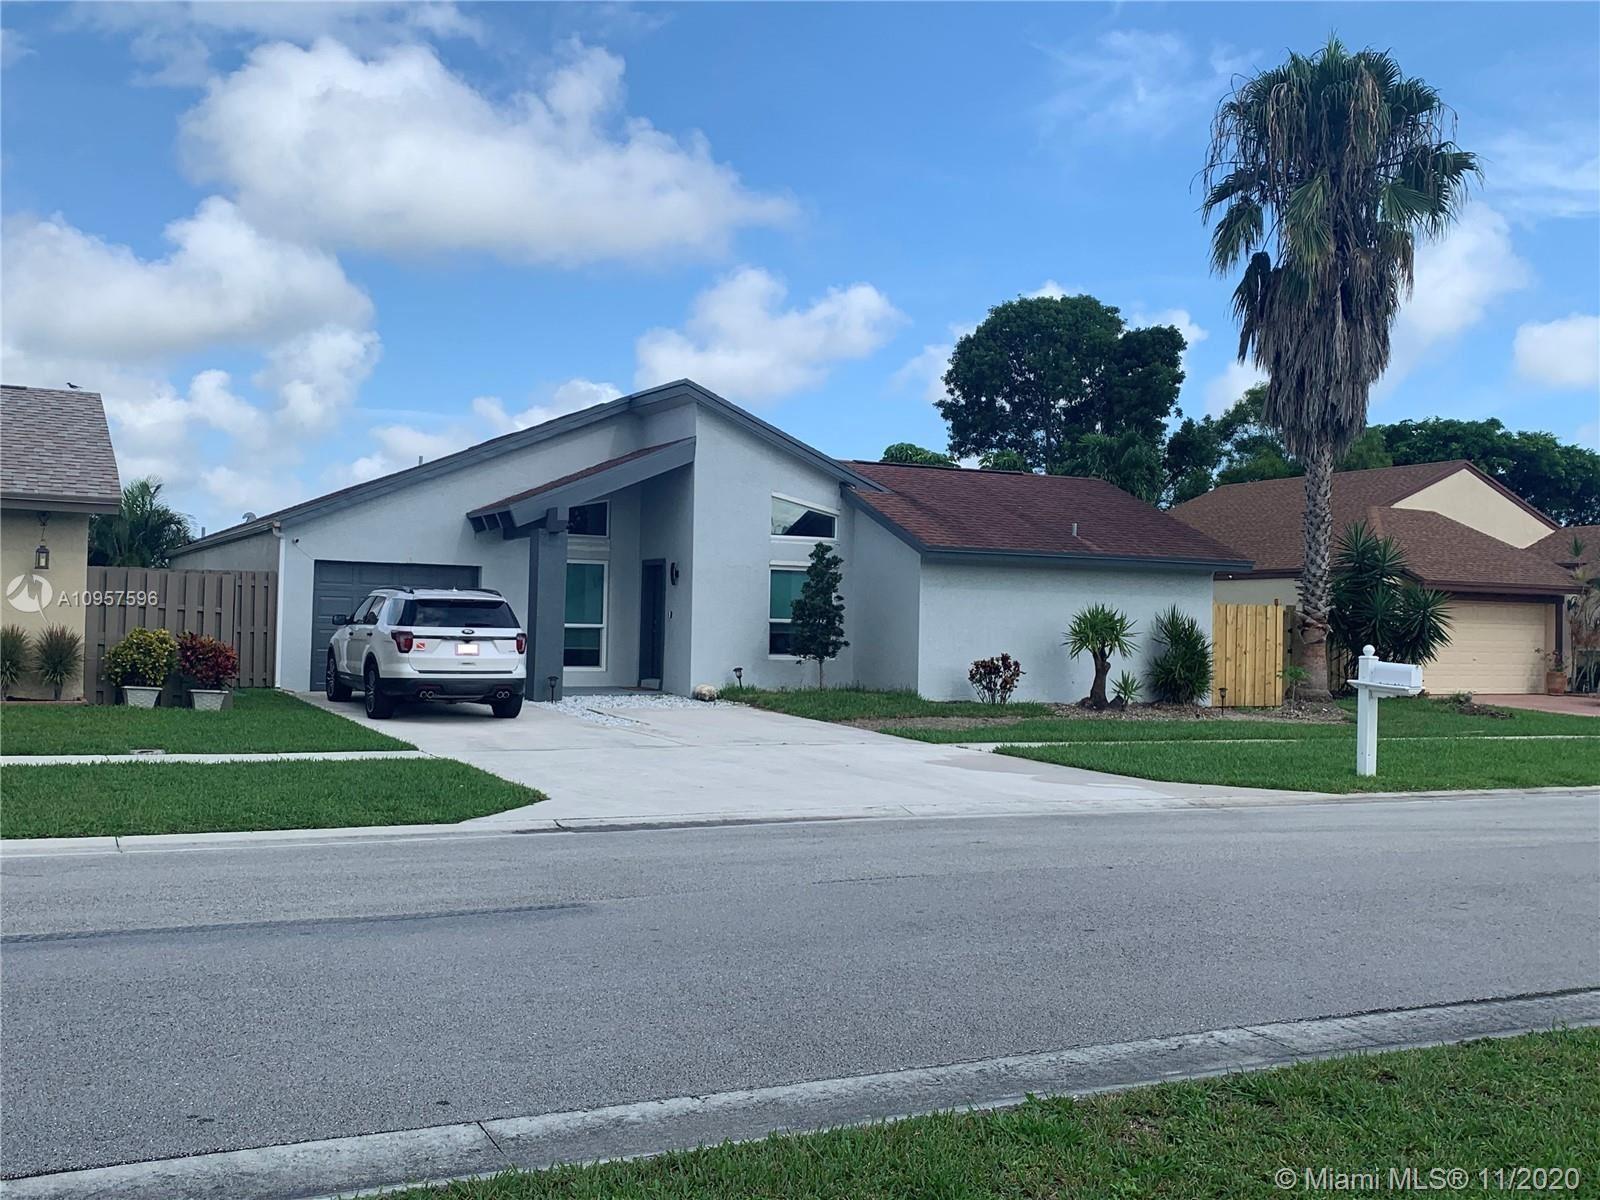 21601 Woodstream Ter, Boca Raton, FL 33428 - #: A10957596